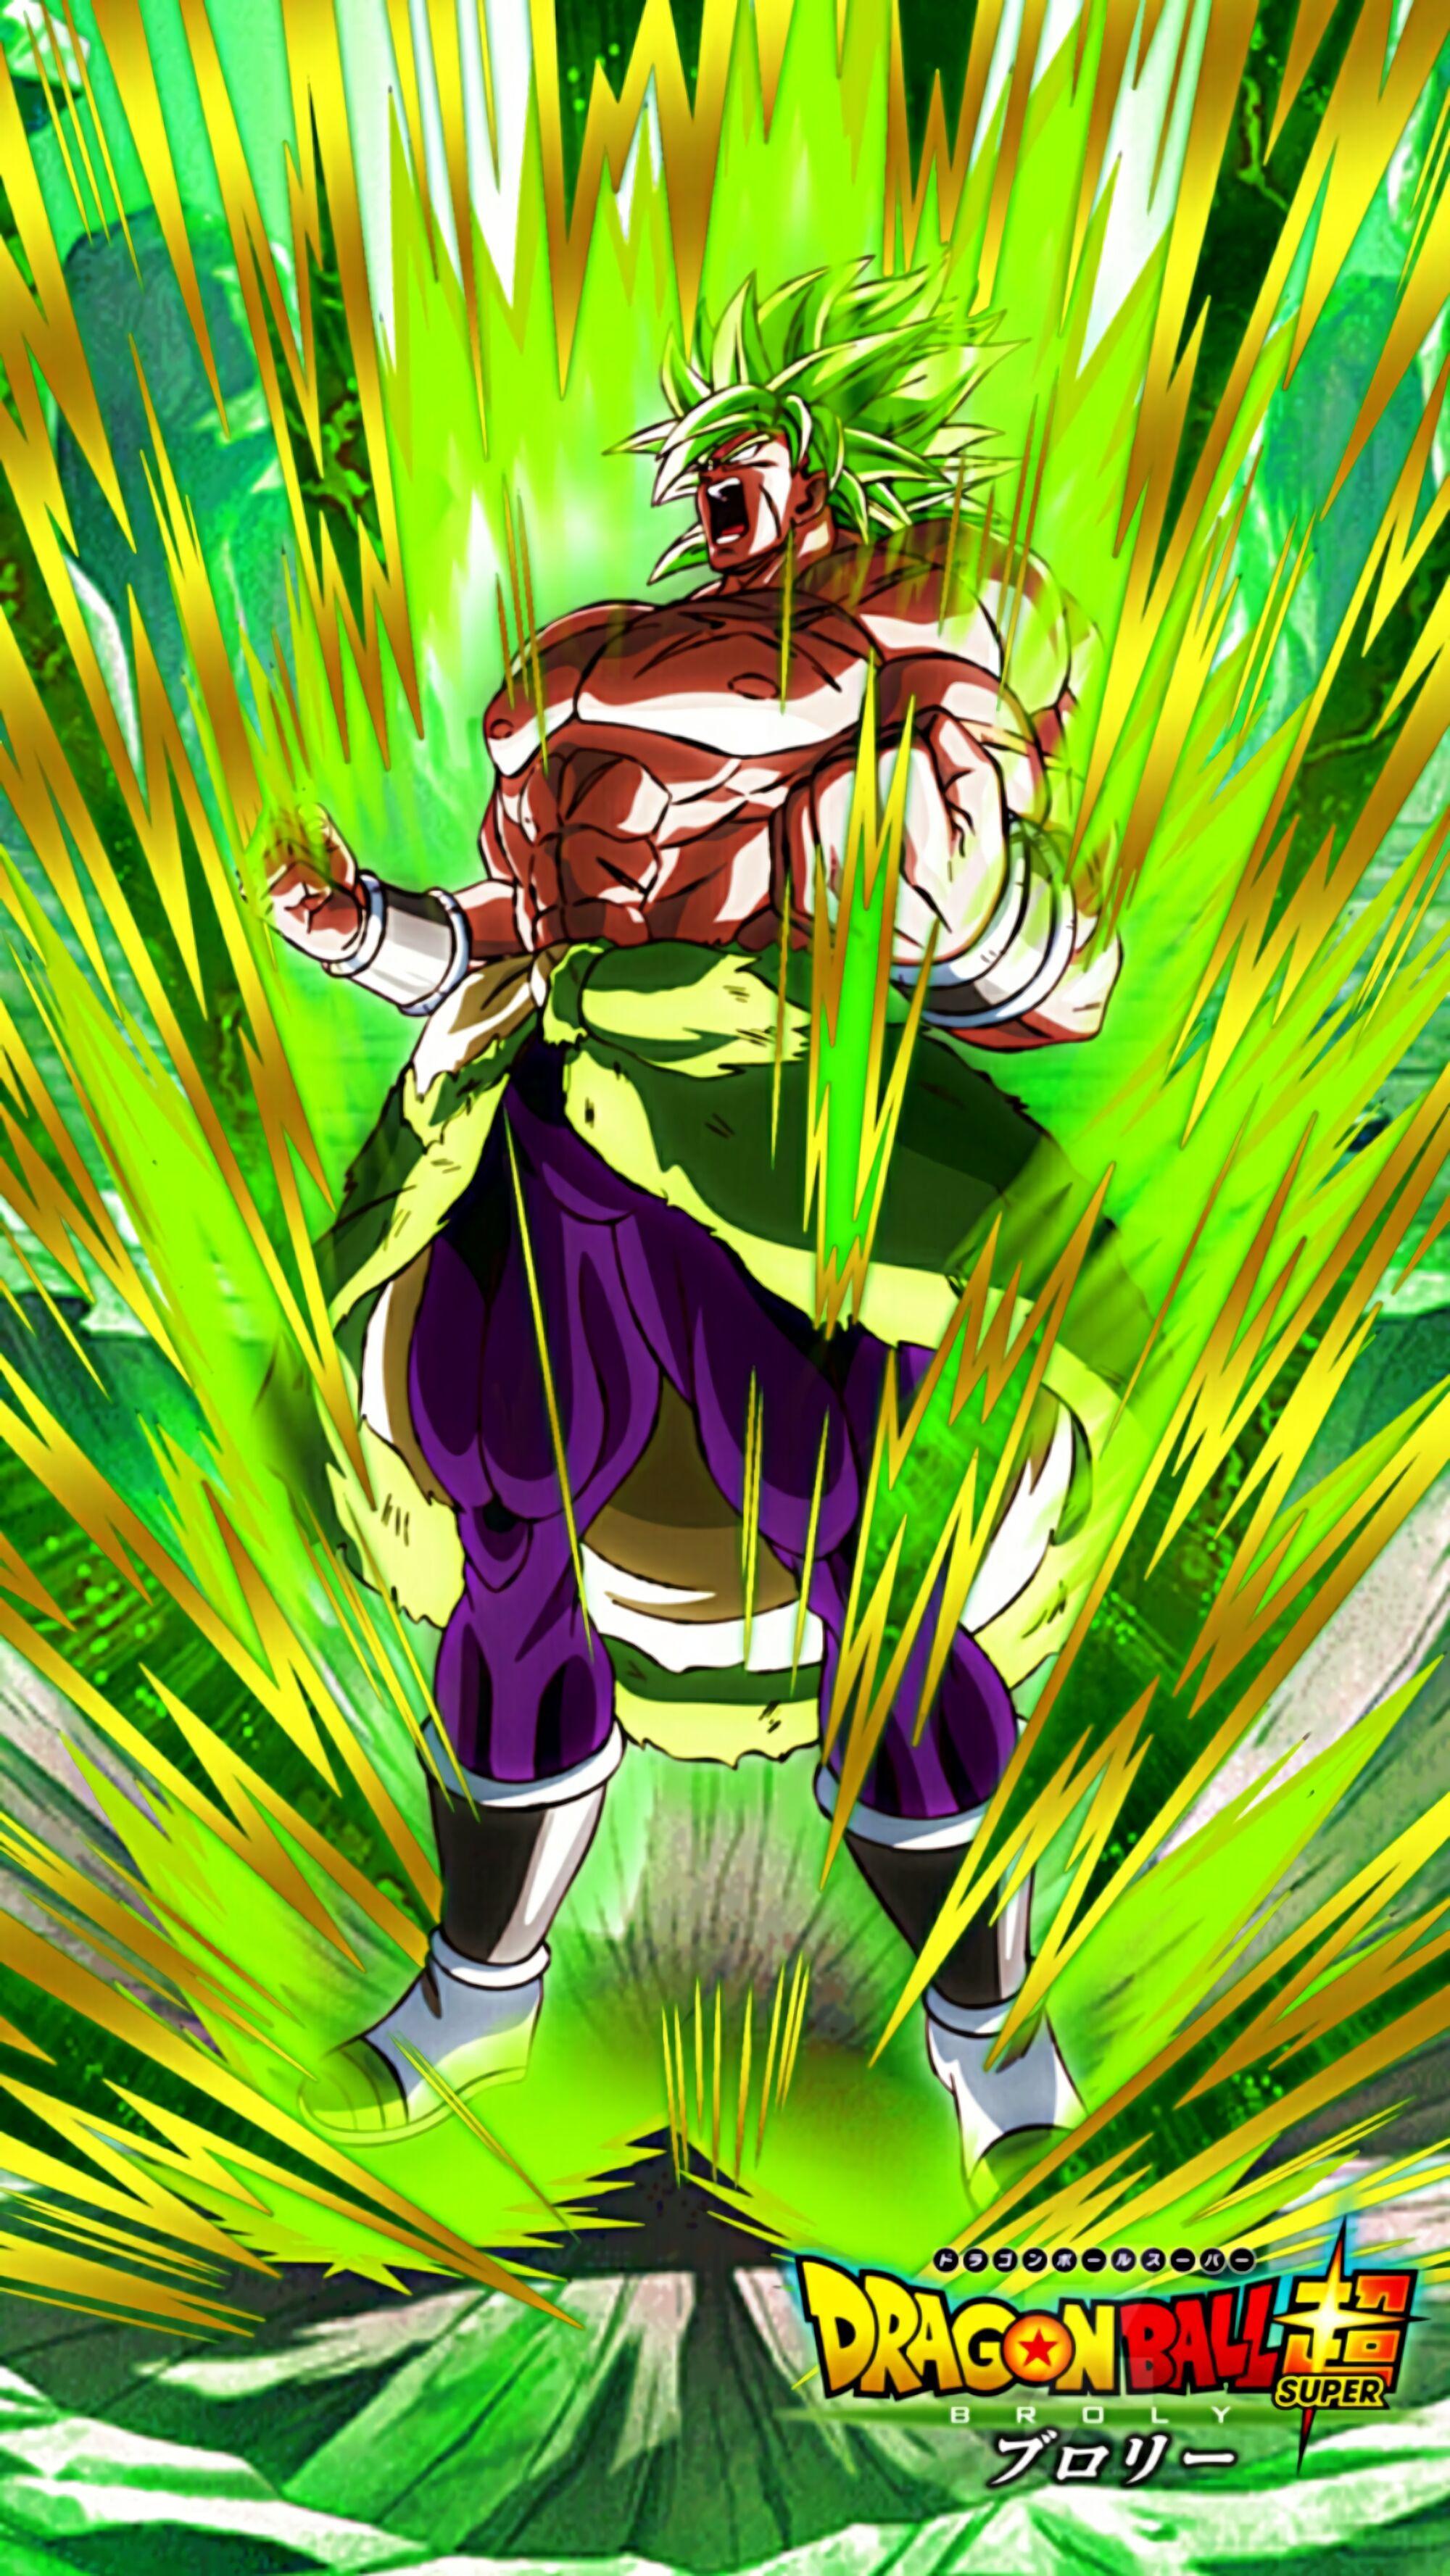 Goku vs broly fan animation - 1 1